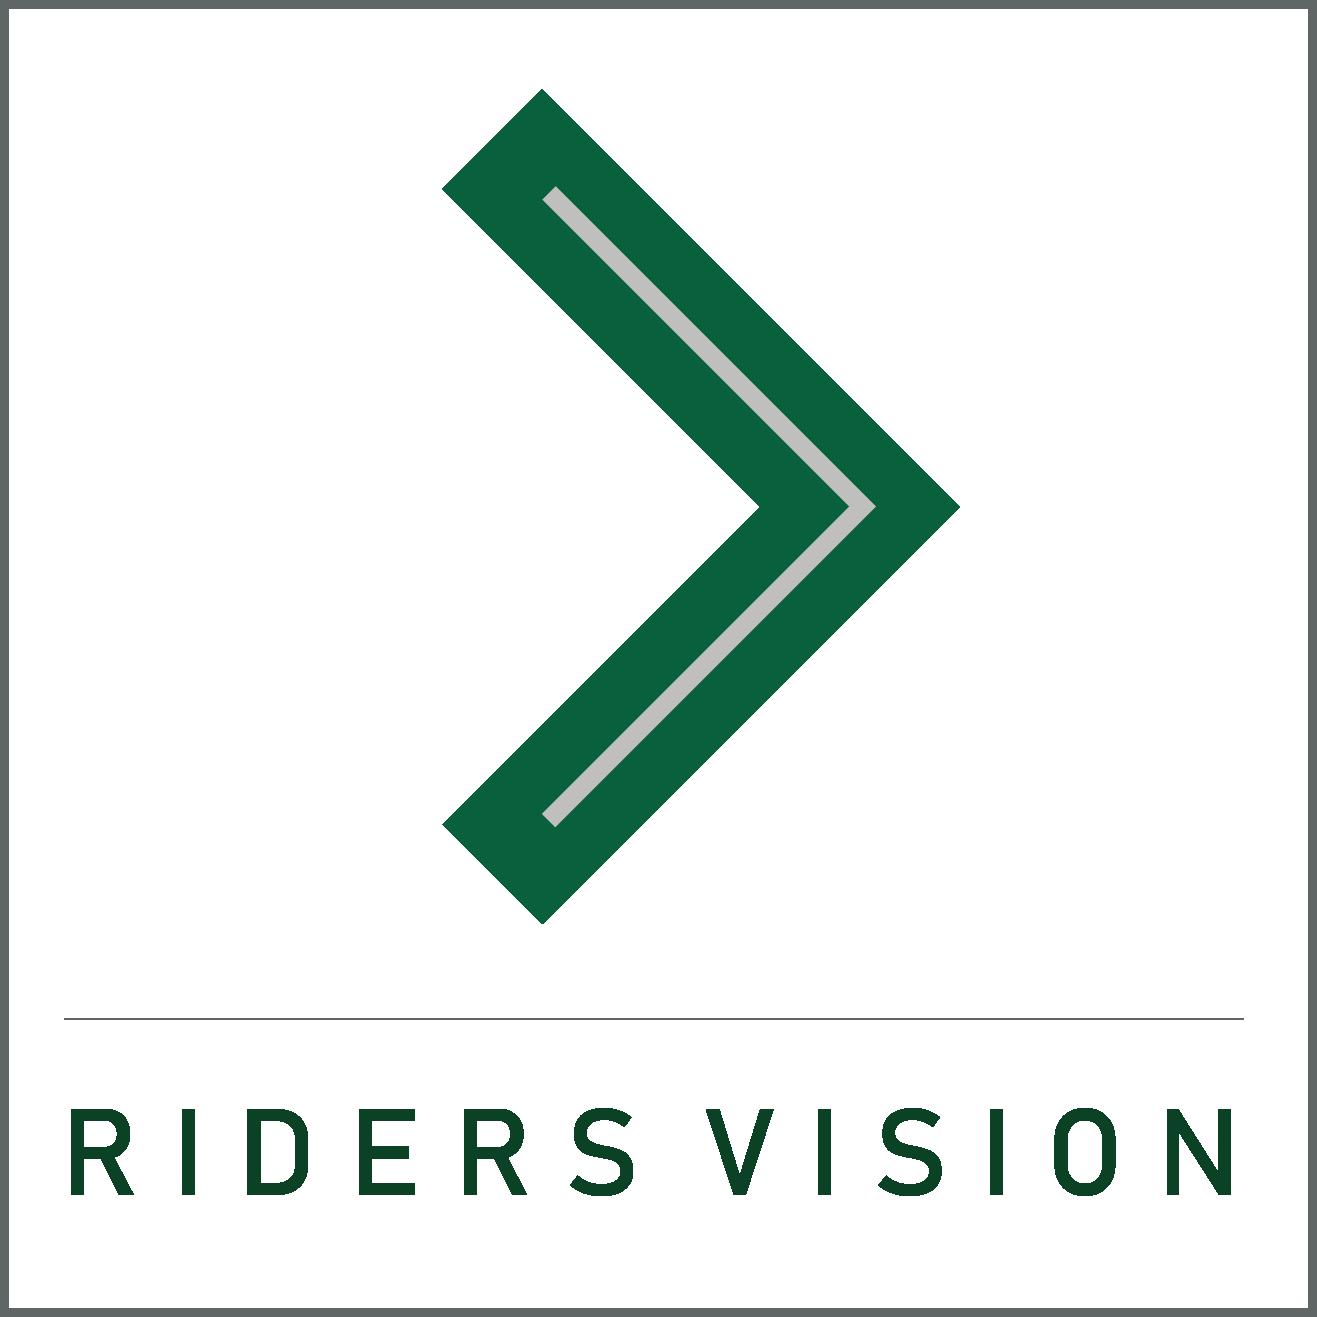 Riders Vision